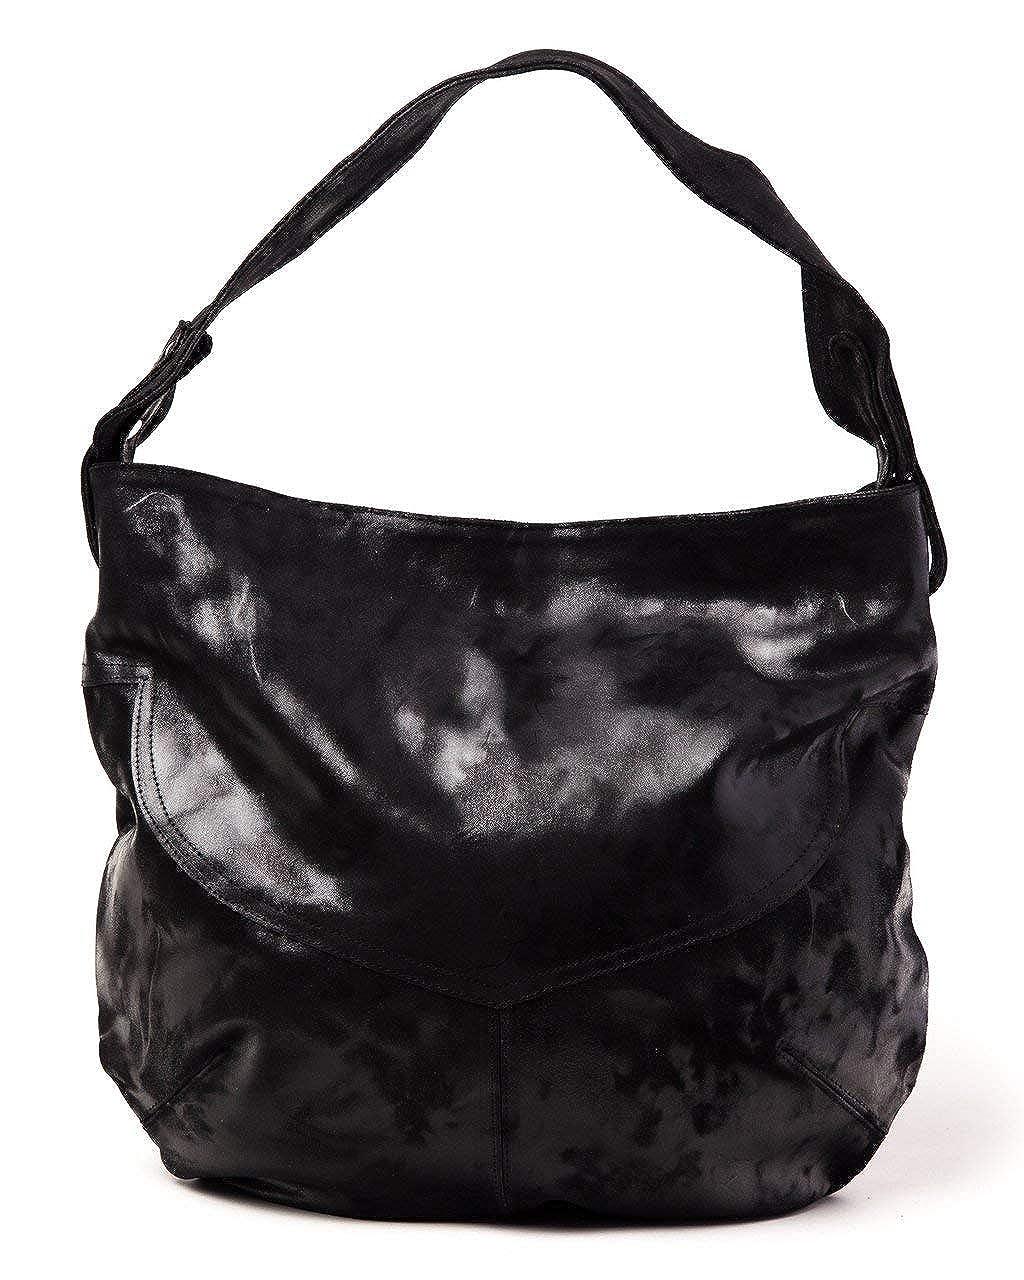 Over 15 Unique Patterns CoFi Handmade Genuine Full Grain Leather Diana Hobo Bag